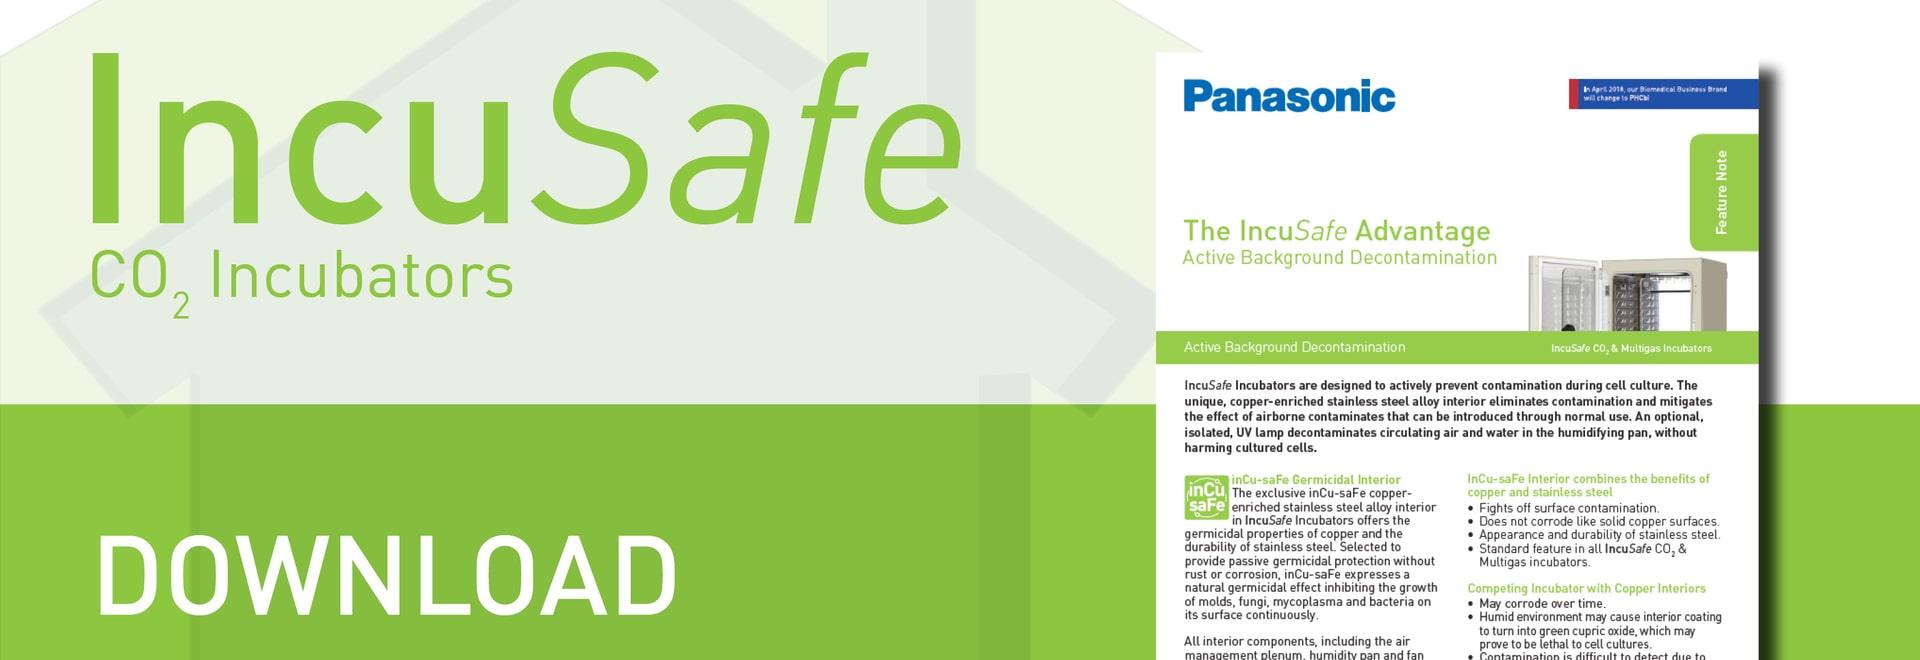 The IncuSafe Advantage: Active Background Decontamination